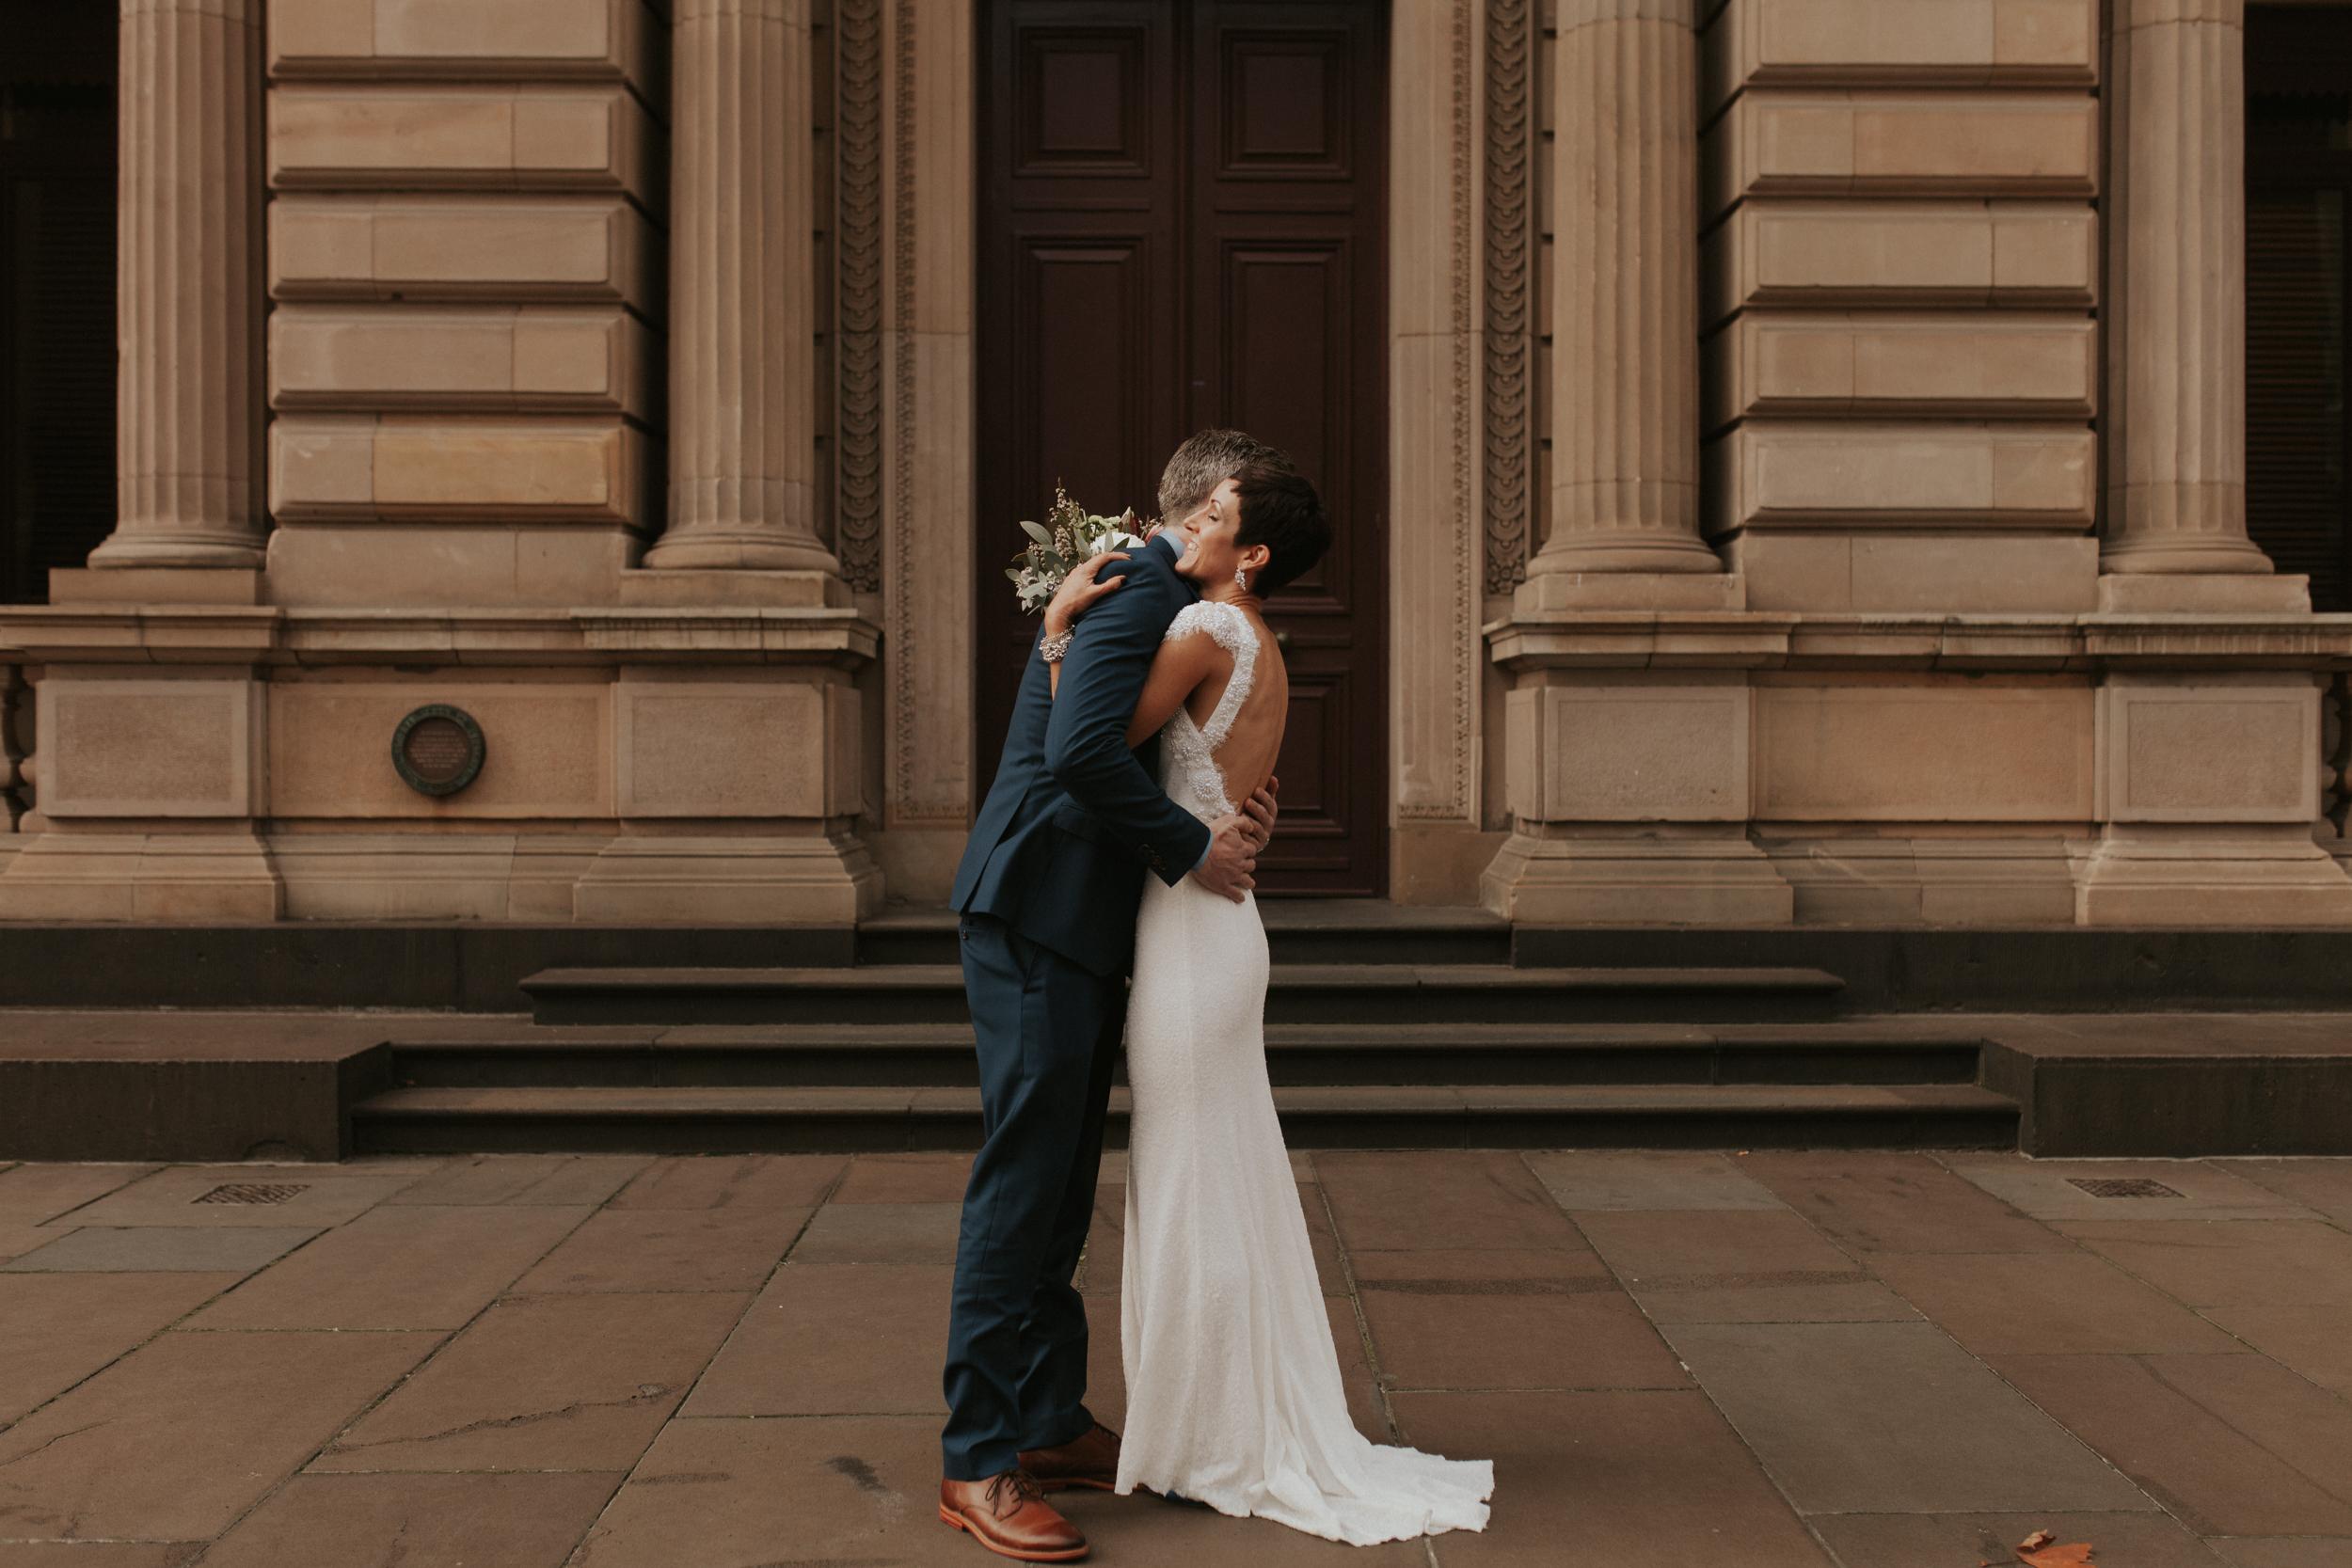 Melbourne-city-wedding-emotionsandmath-003.jpg